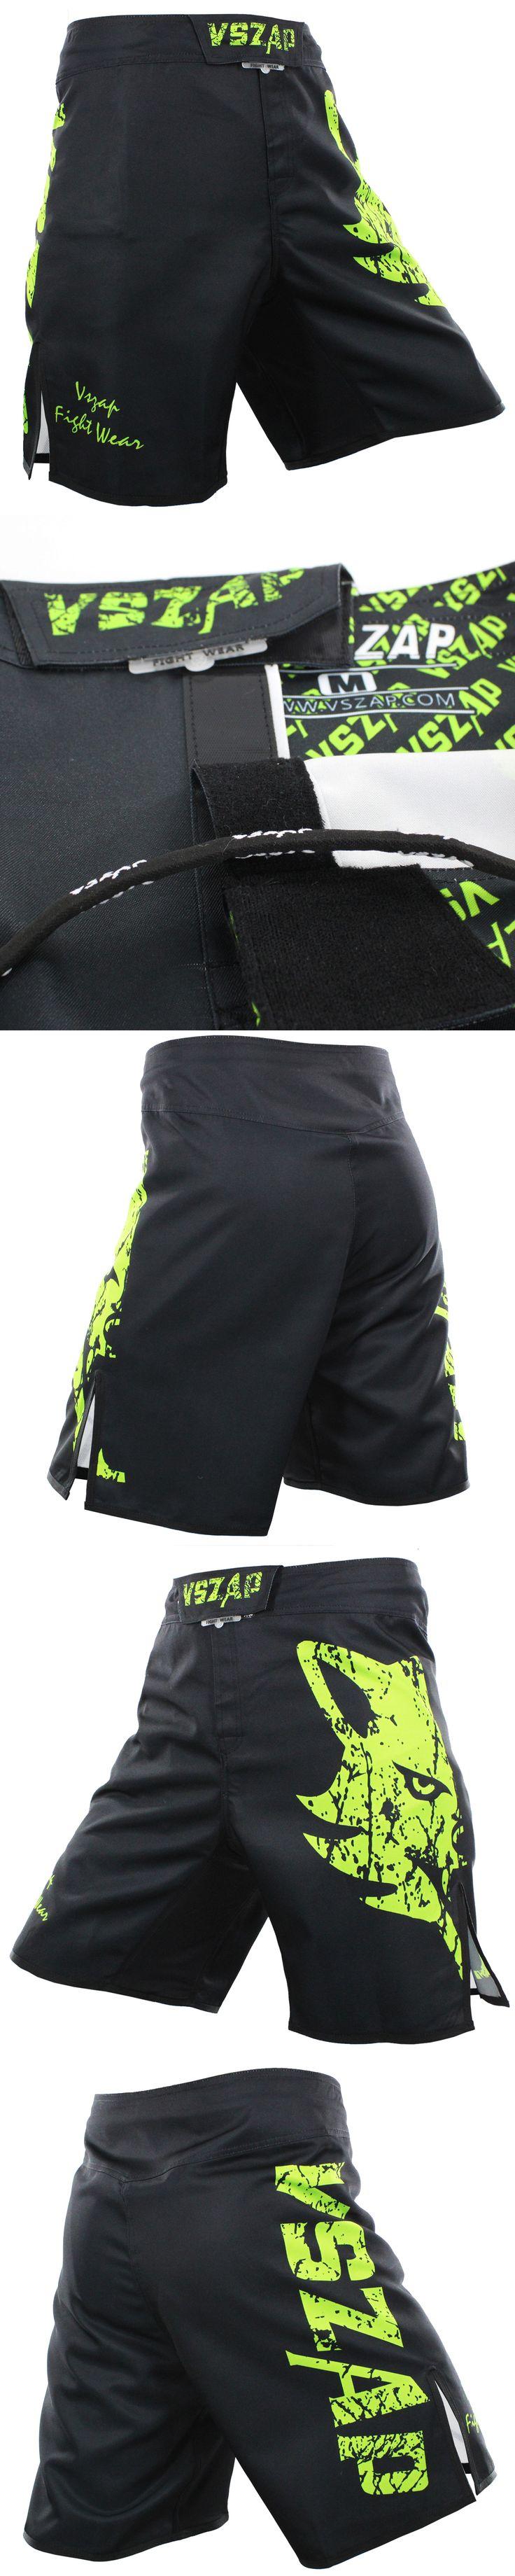 VSZAP GIANT mens shorts MMA muay Thai shorts Thick fabrics Elastic crotch T hook and loop fastener Activities Fashion shorts